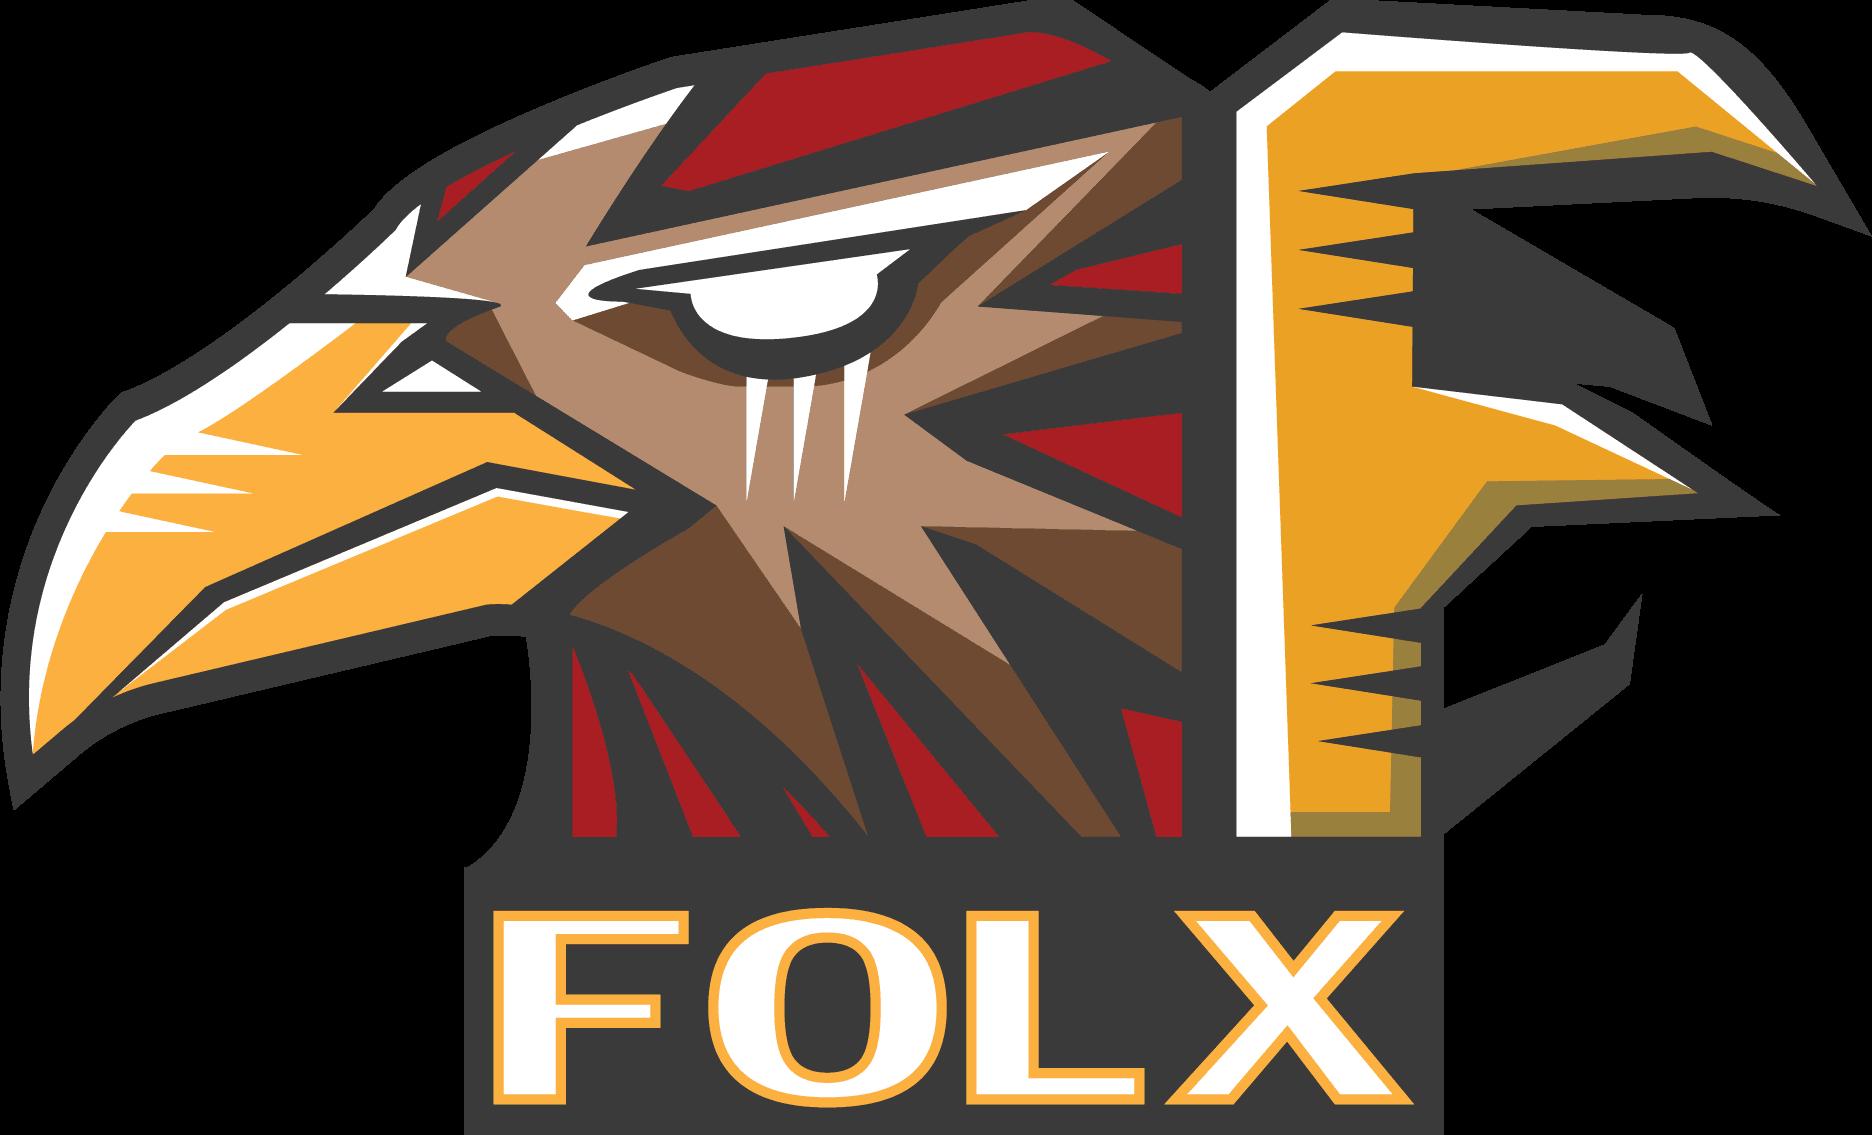 Team Folx logo